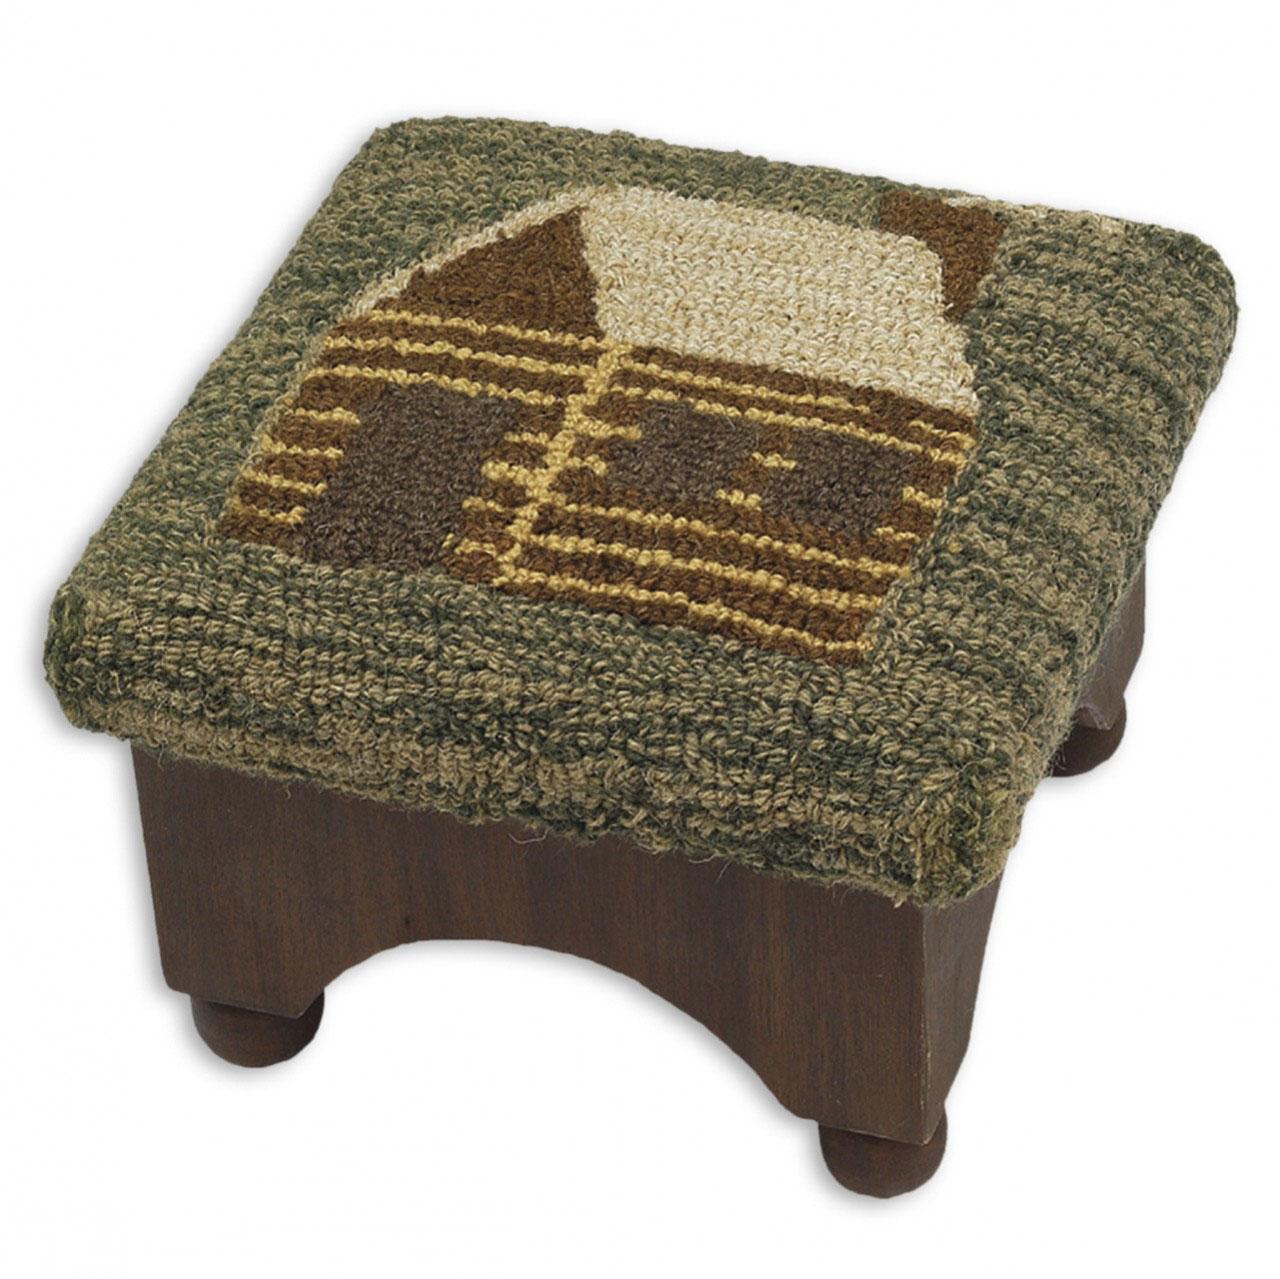 Rustic cabin furniture - Rustic Cabin Furniture 31